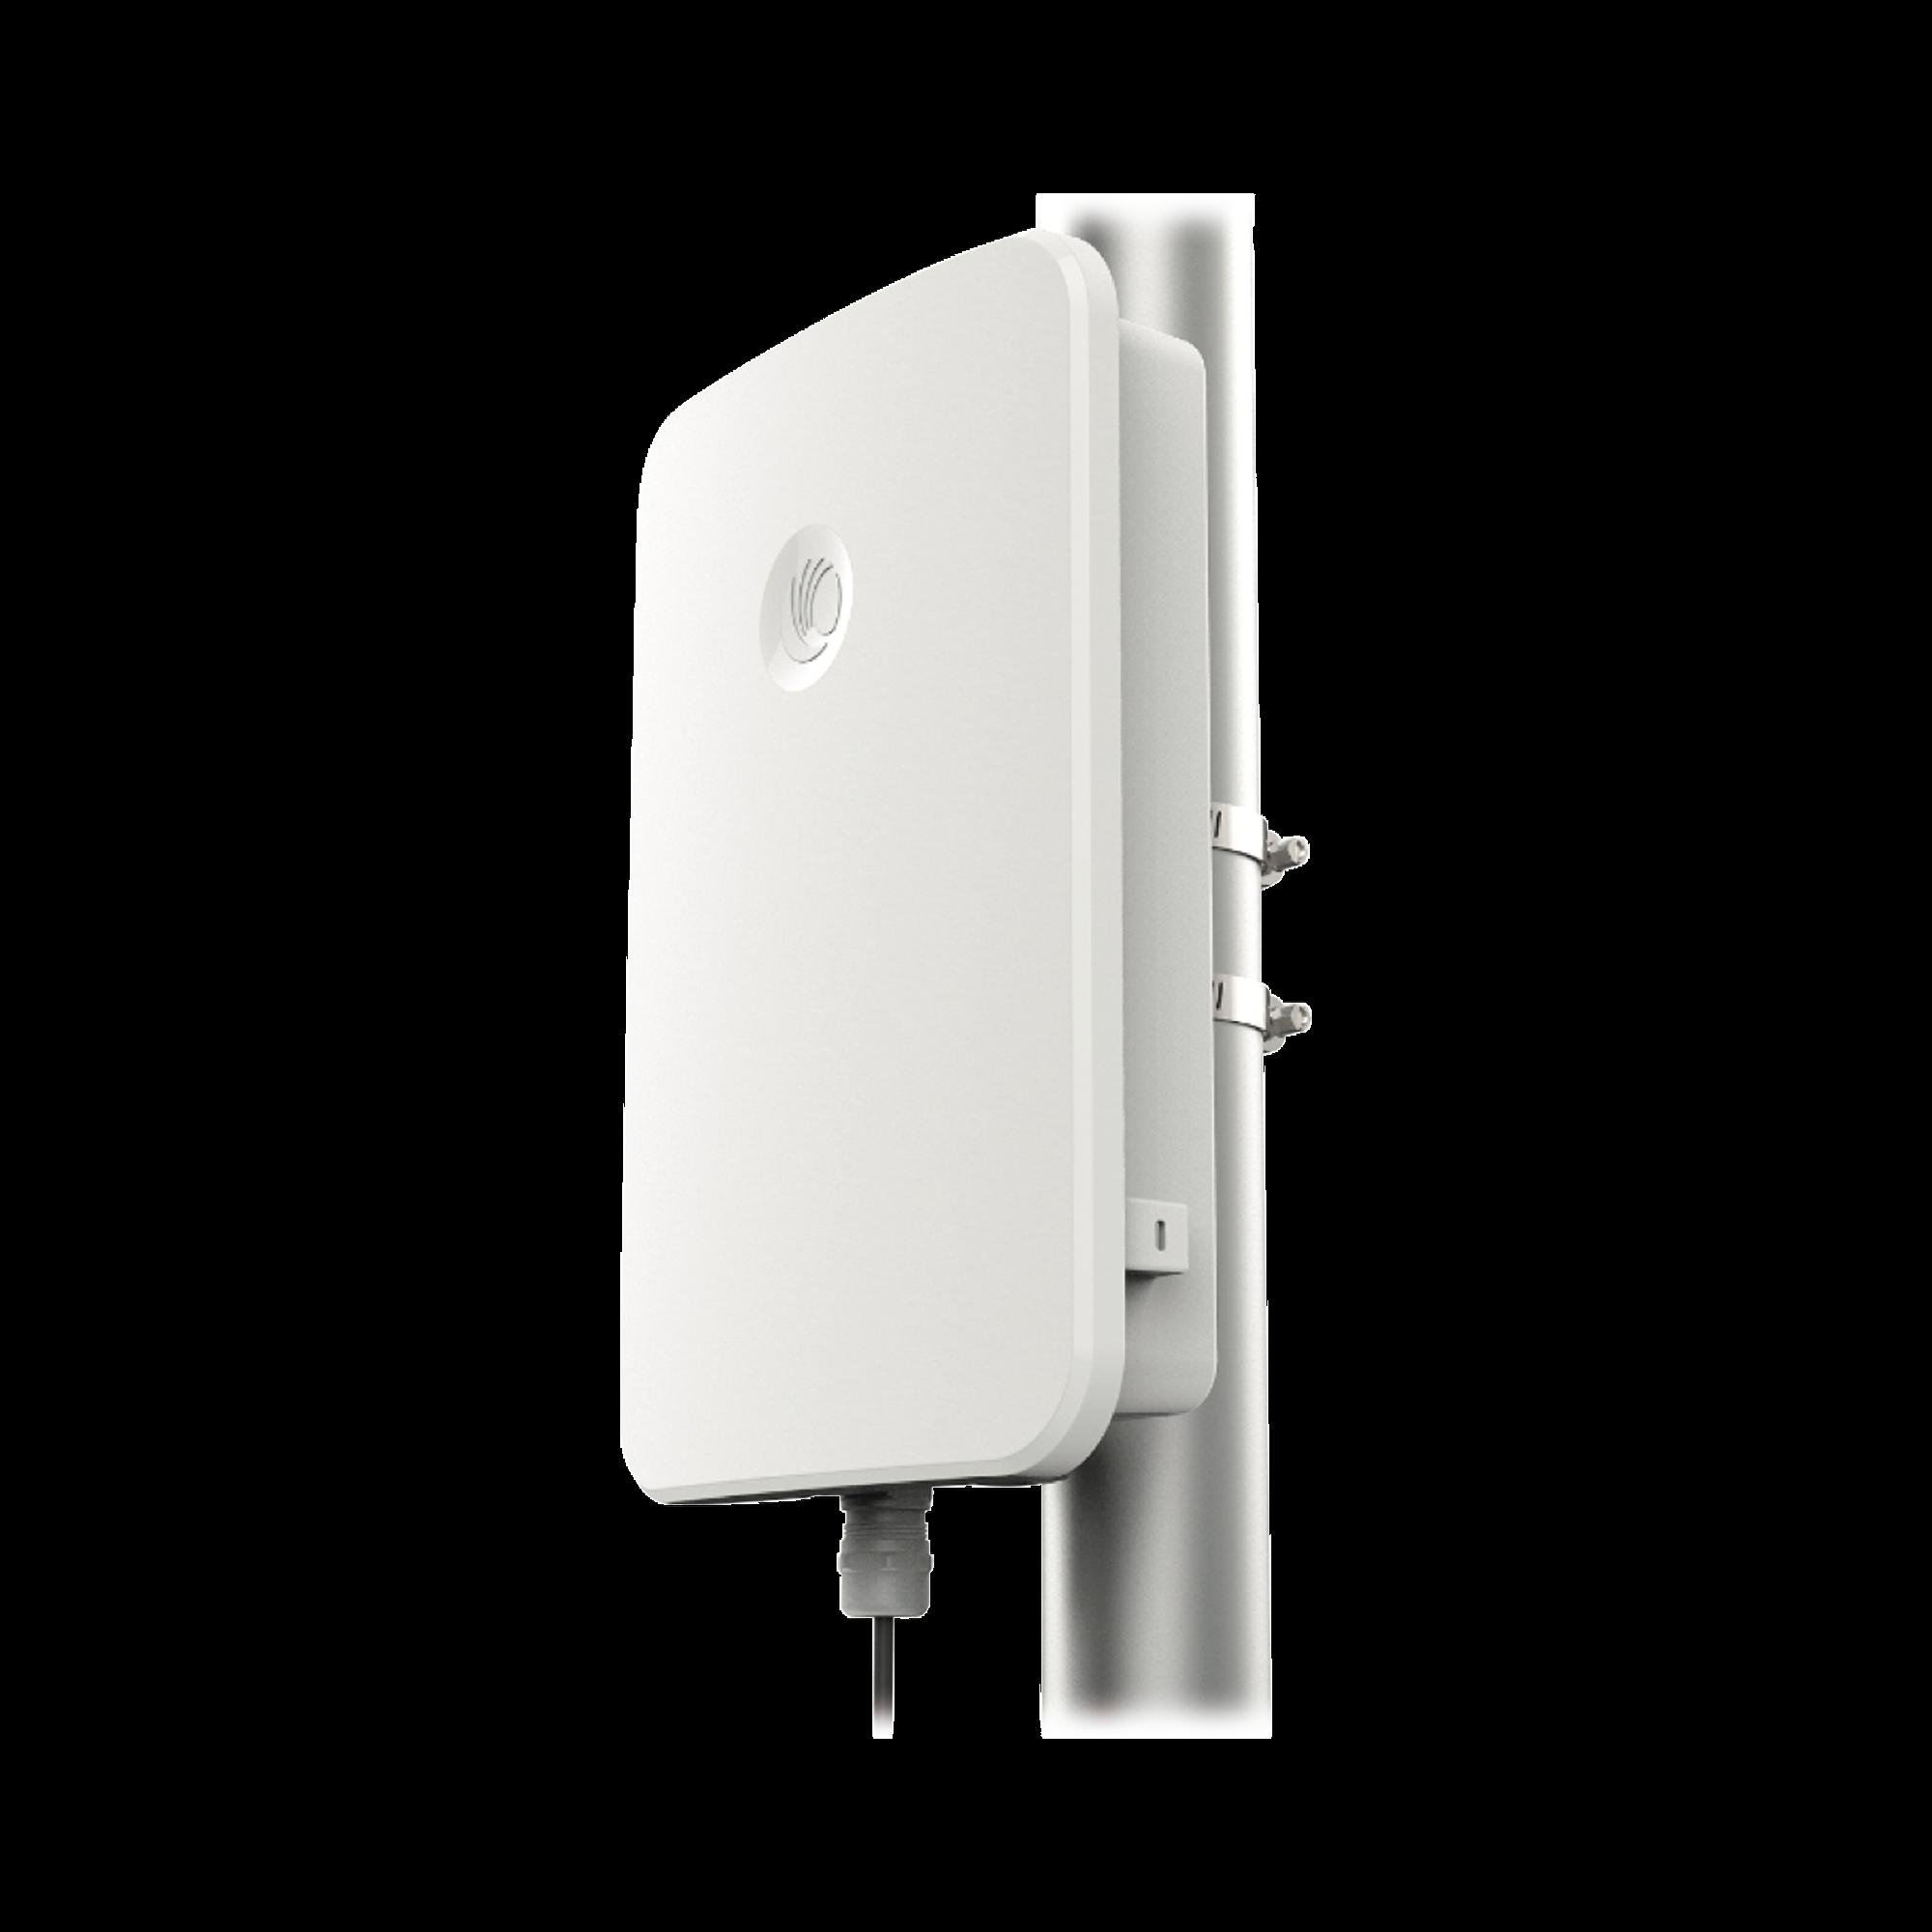 HUB 360r cnVision para enlazar cámaras de videovigilancia de Clientes cnVision a distancias de hasta 1.5 km